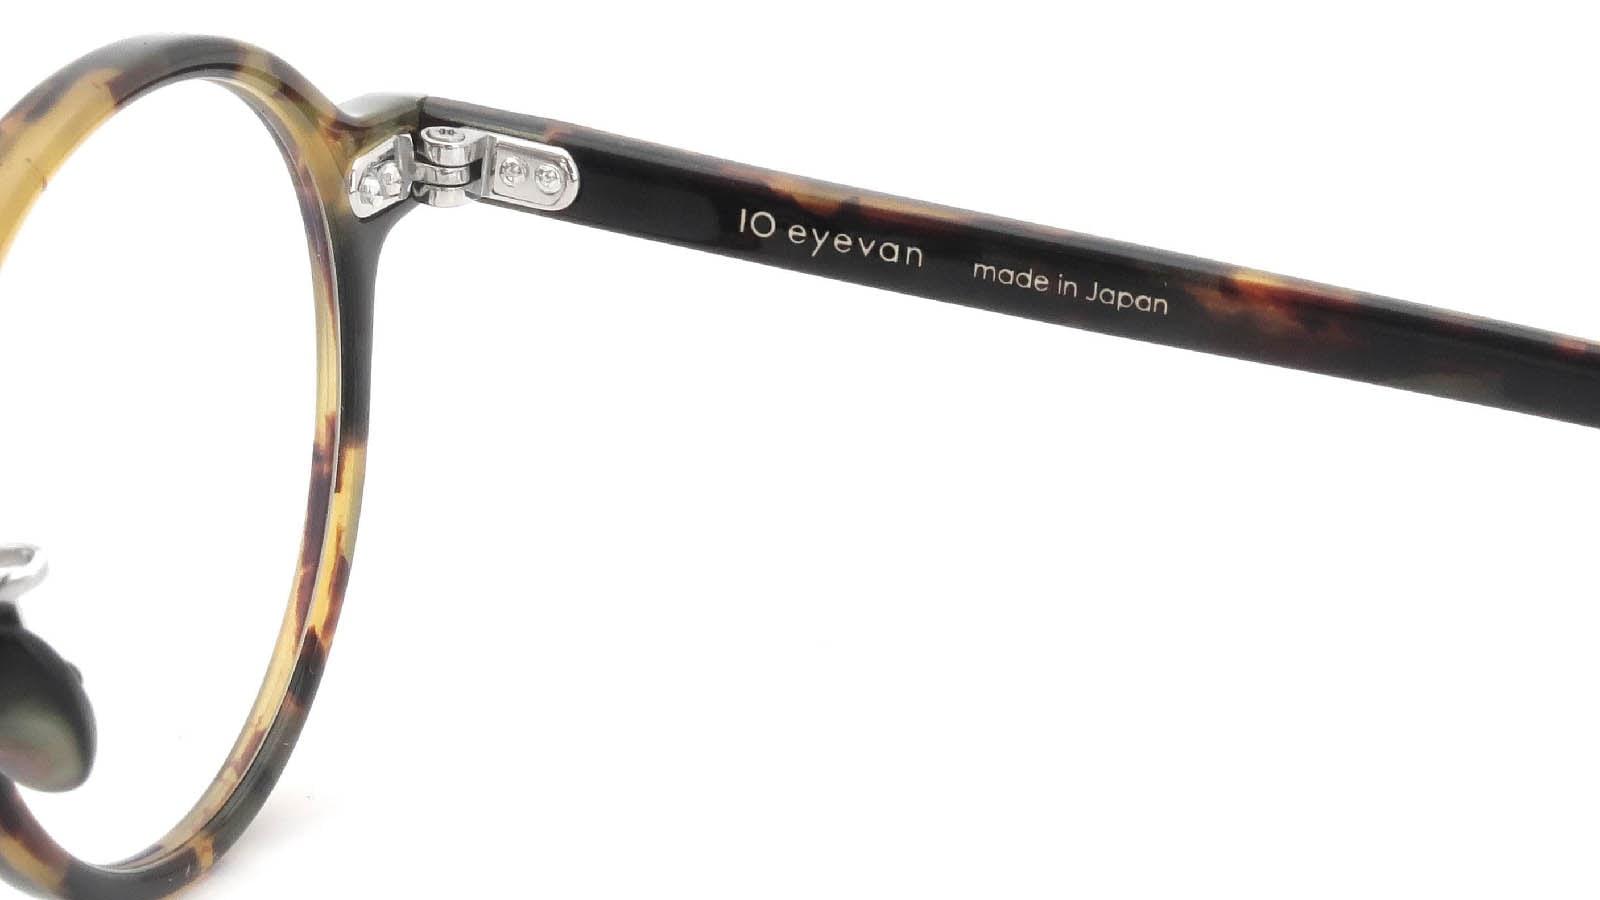 10 eyevan NO.5 Ⅲ 43size 11